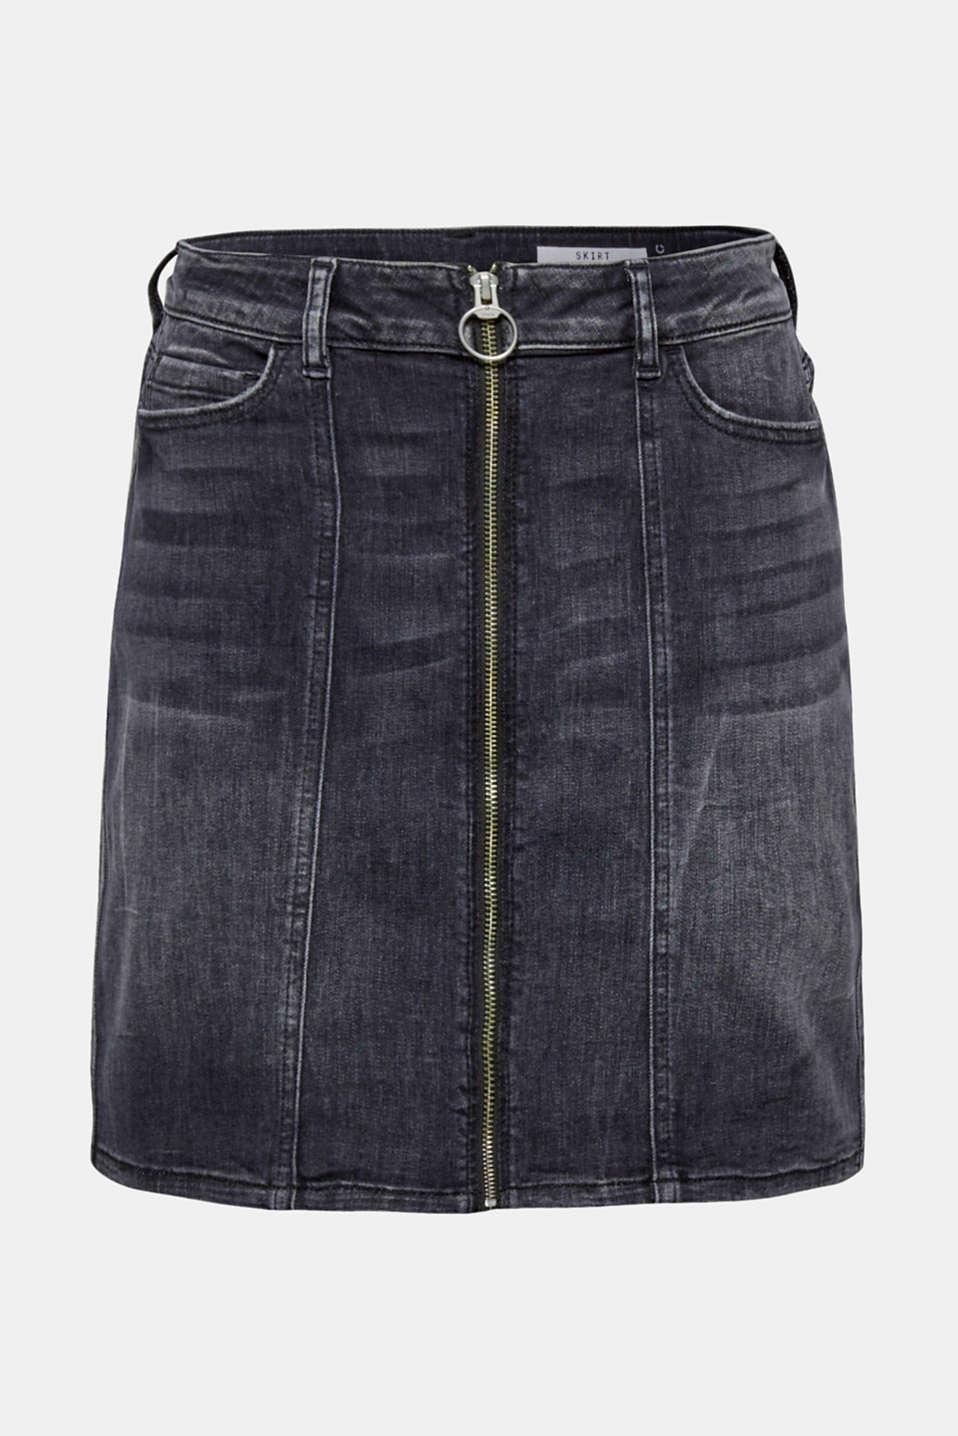 Skirts denim, BLACK DARK WASH, detail image number 8